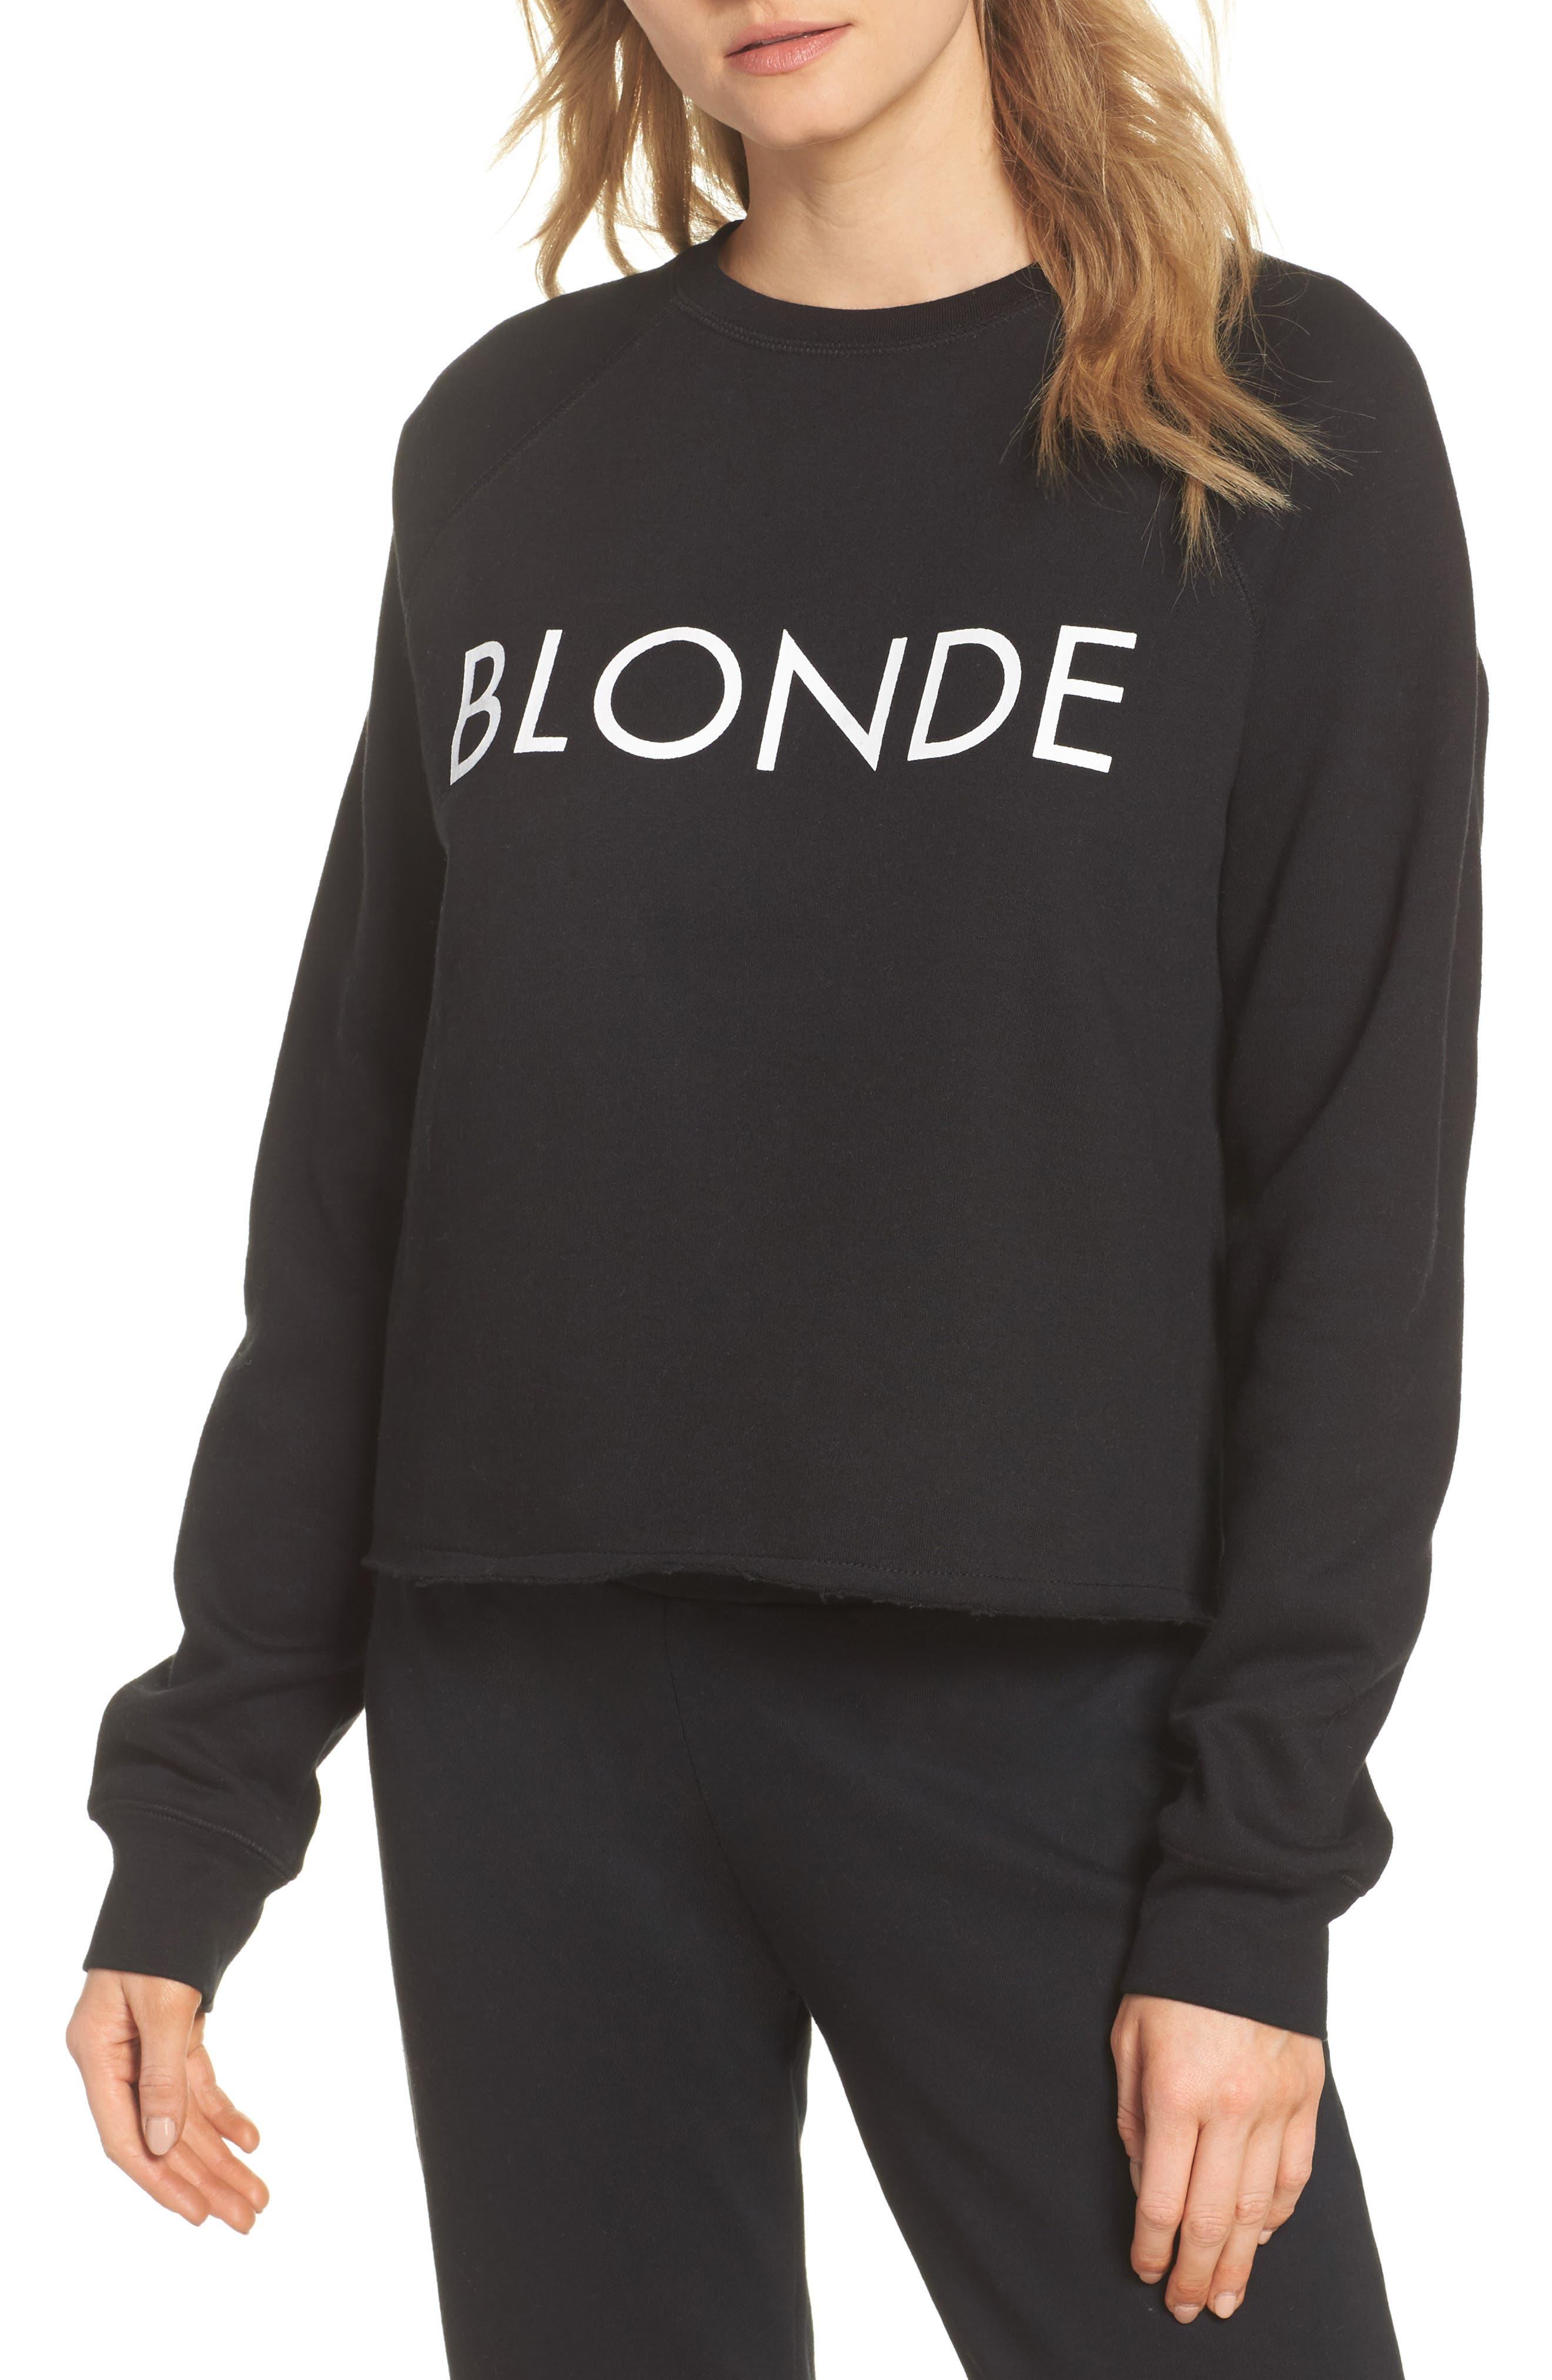 Blonde Raw Hem Sweatshirt,                             Main thumbnail 1, color,                             005